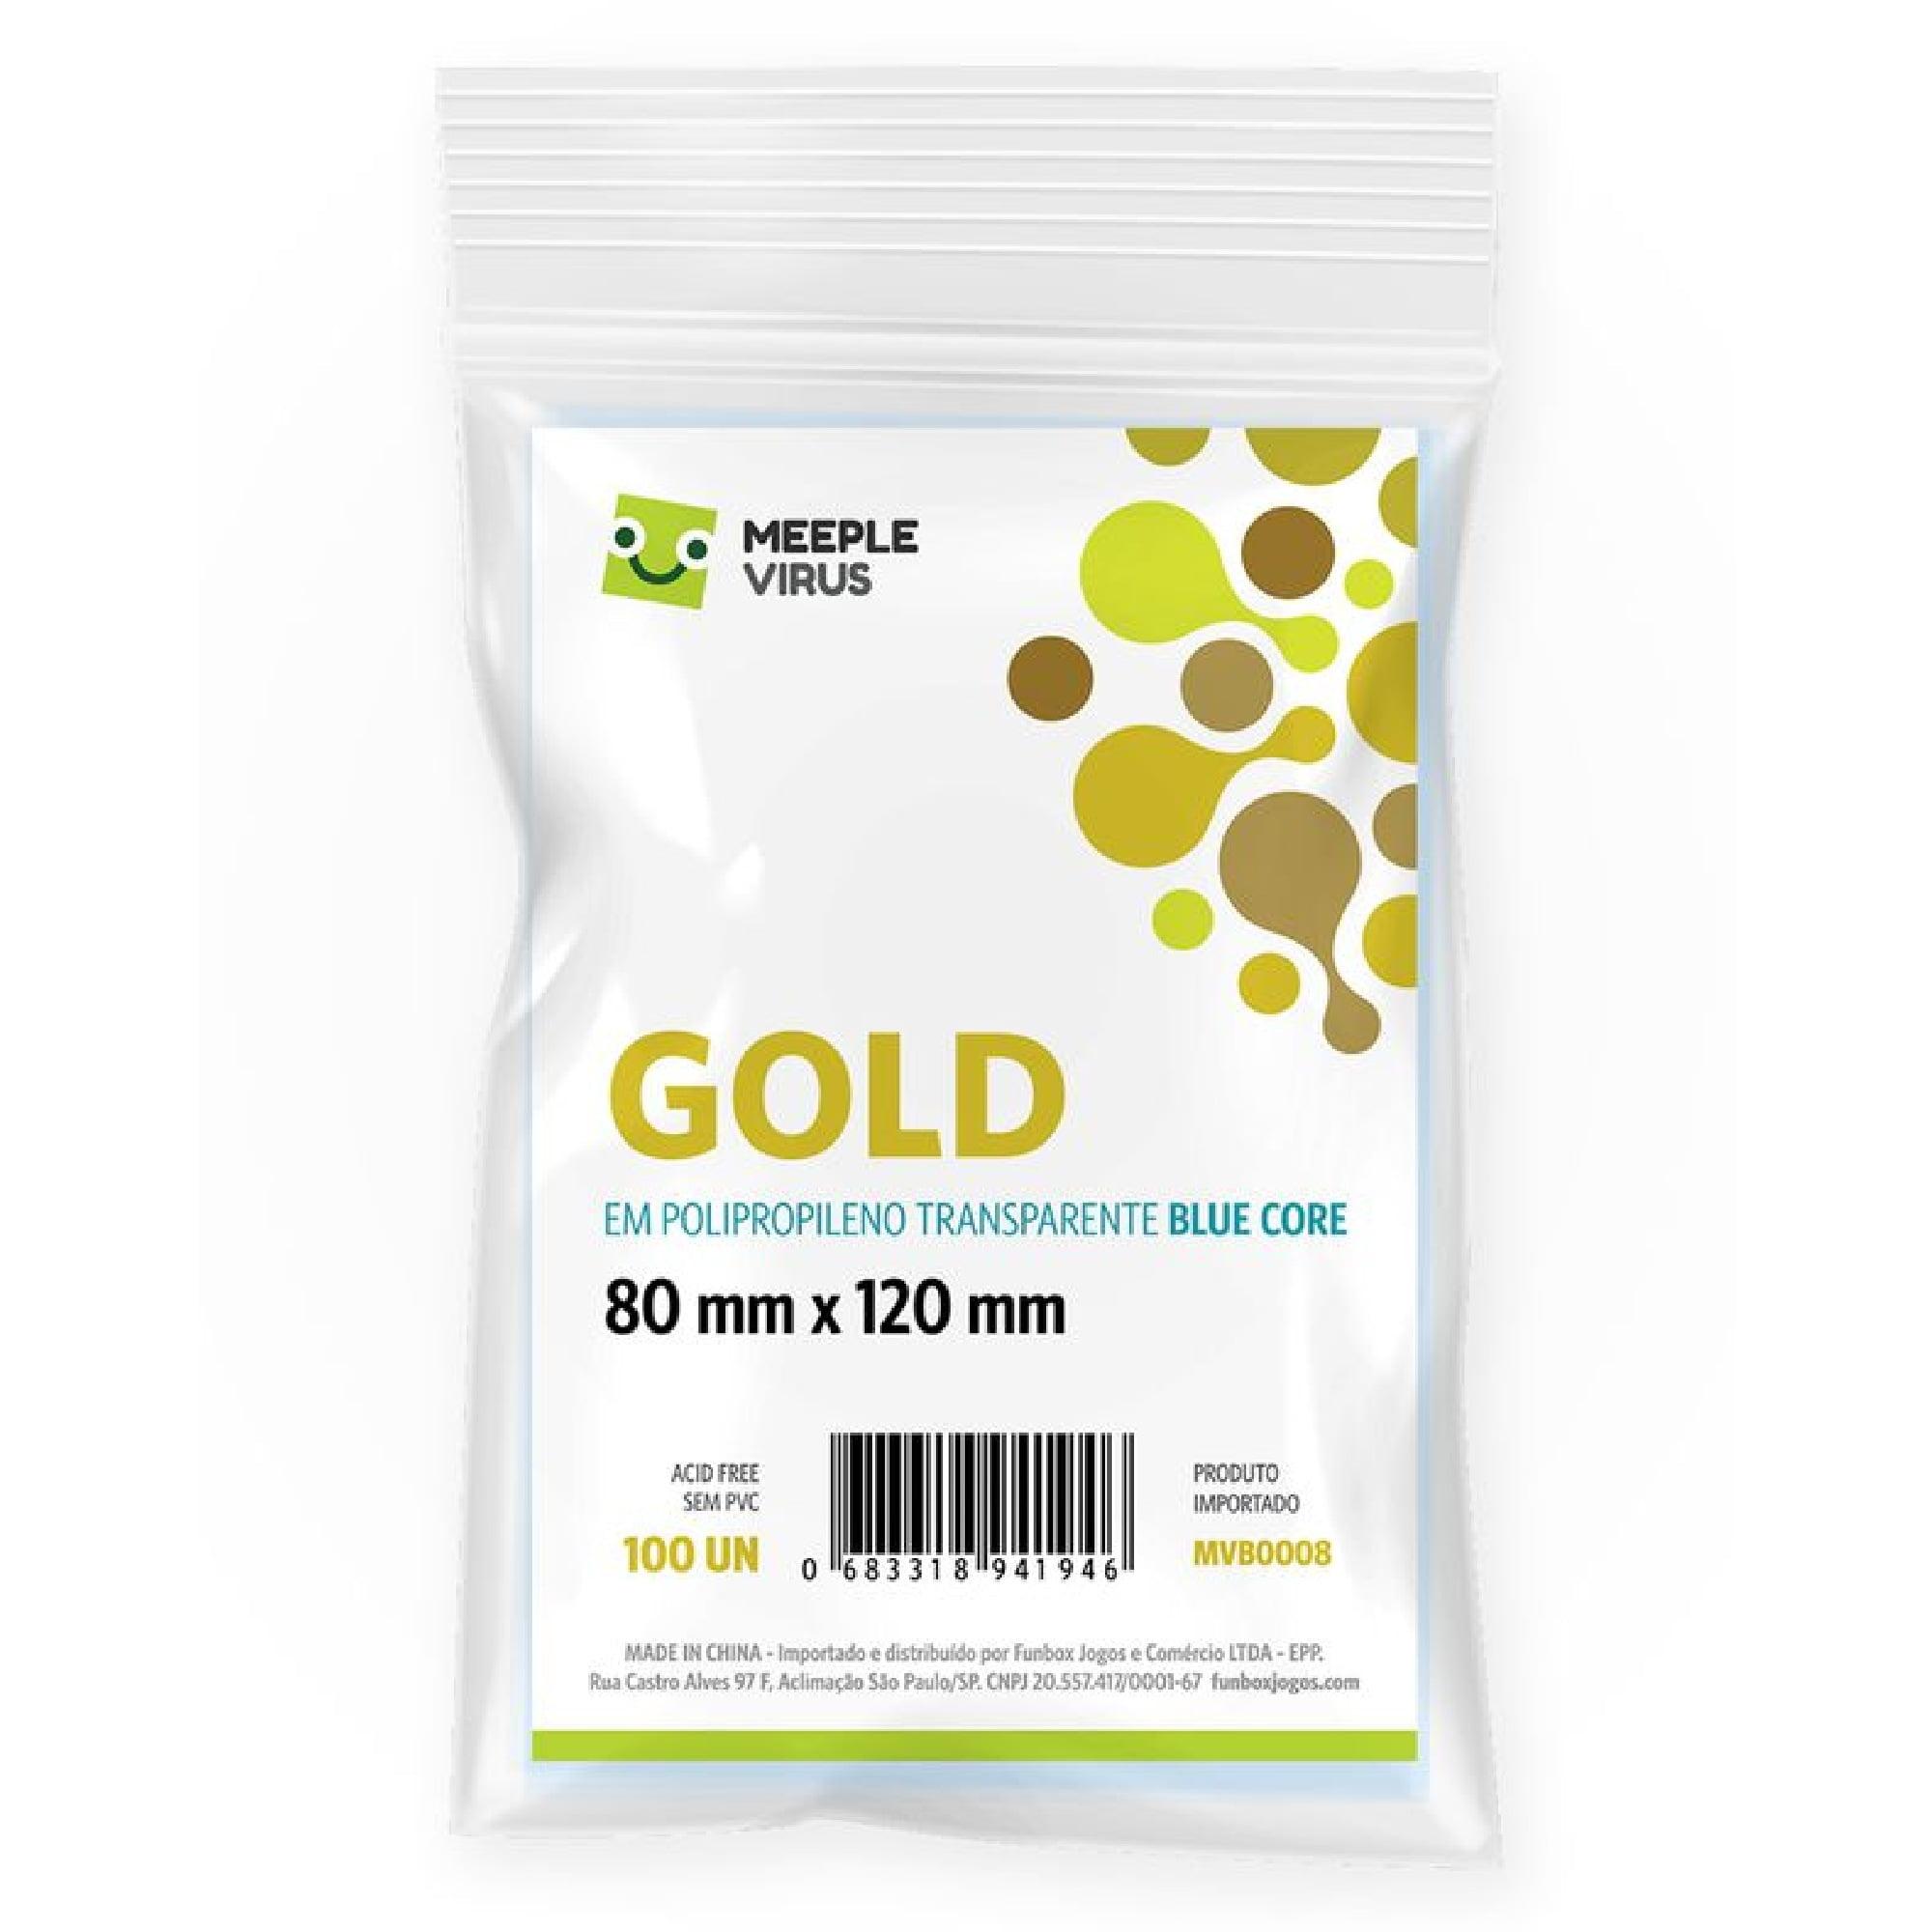 Sleeves Blue Core Gold (80 x 120mm) Meeple Virus